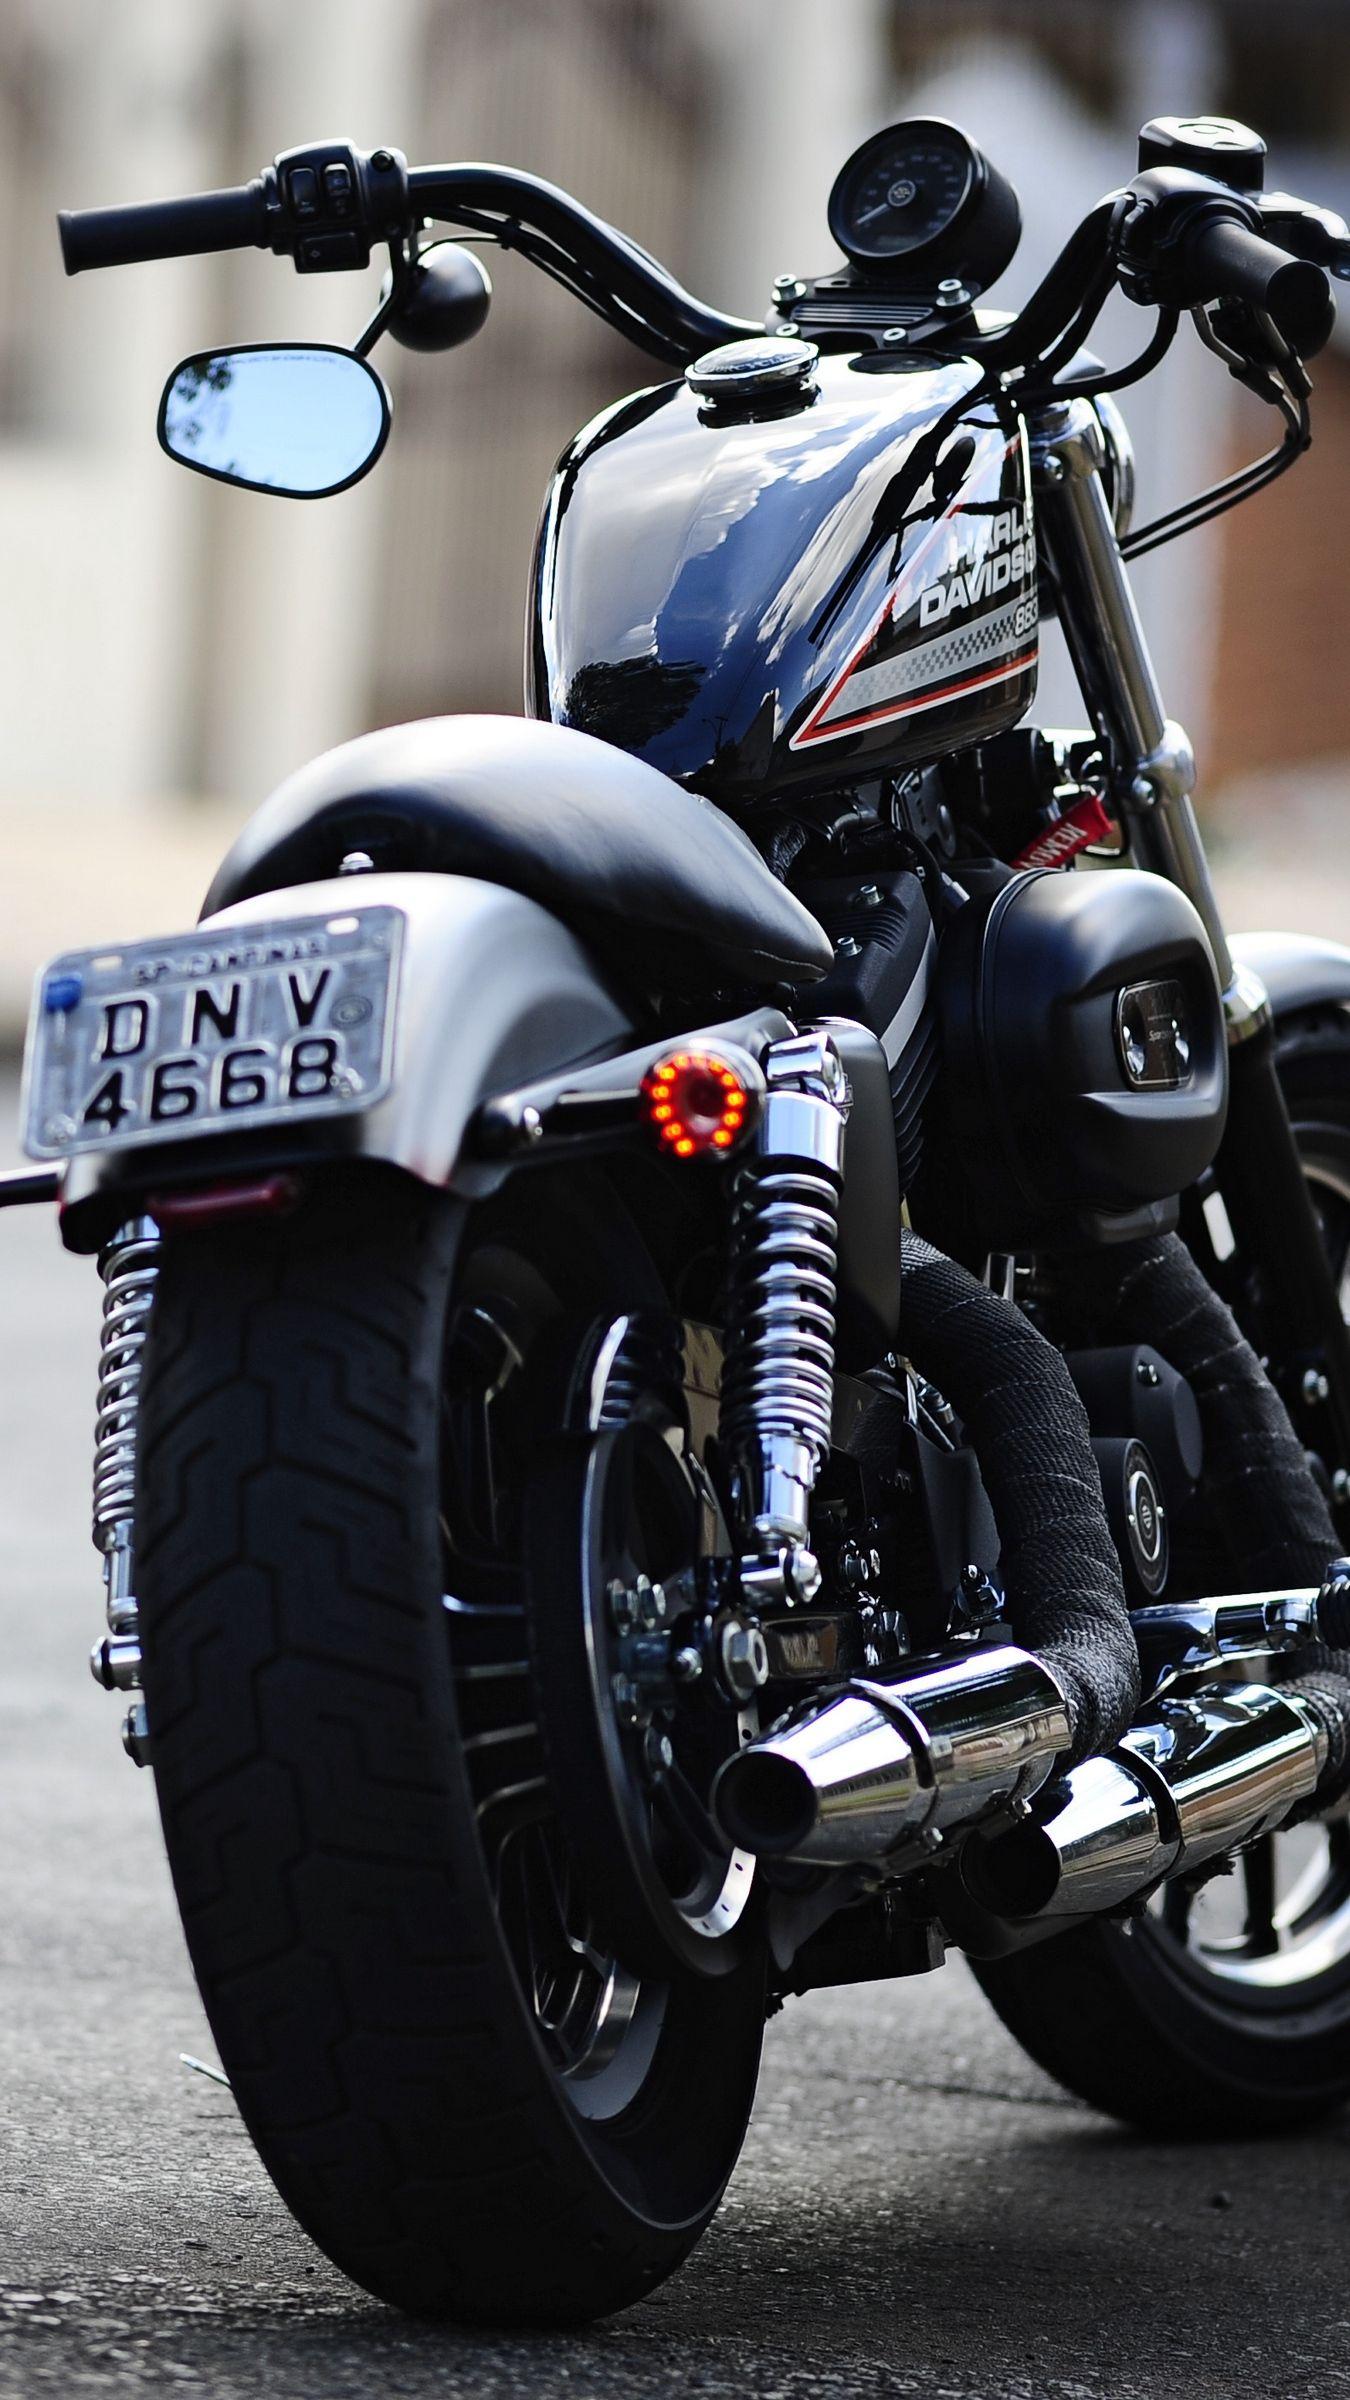 Pin By Mouli Moni On Bikes And Cars Harley Davidson Wallpaper